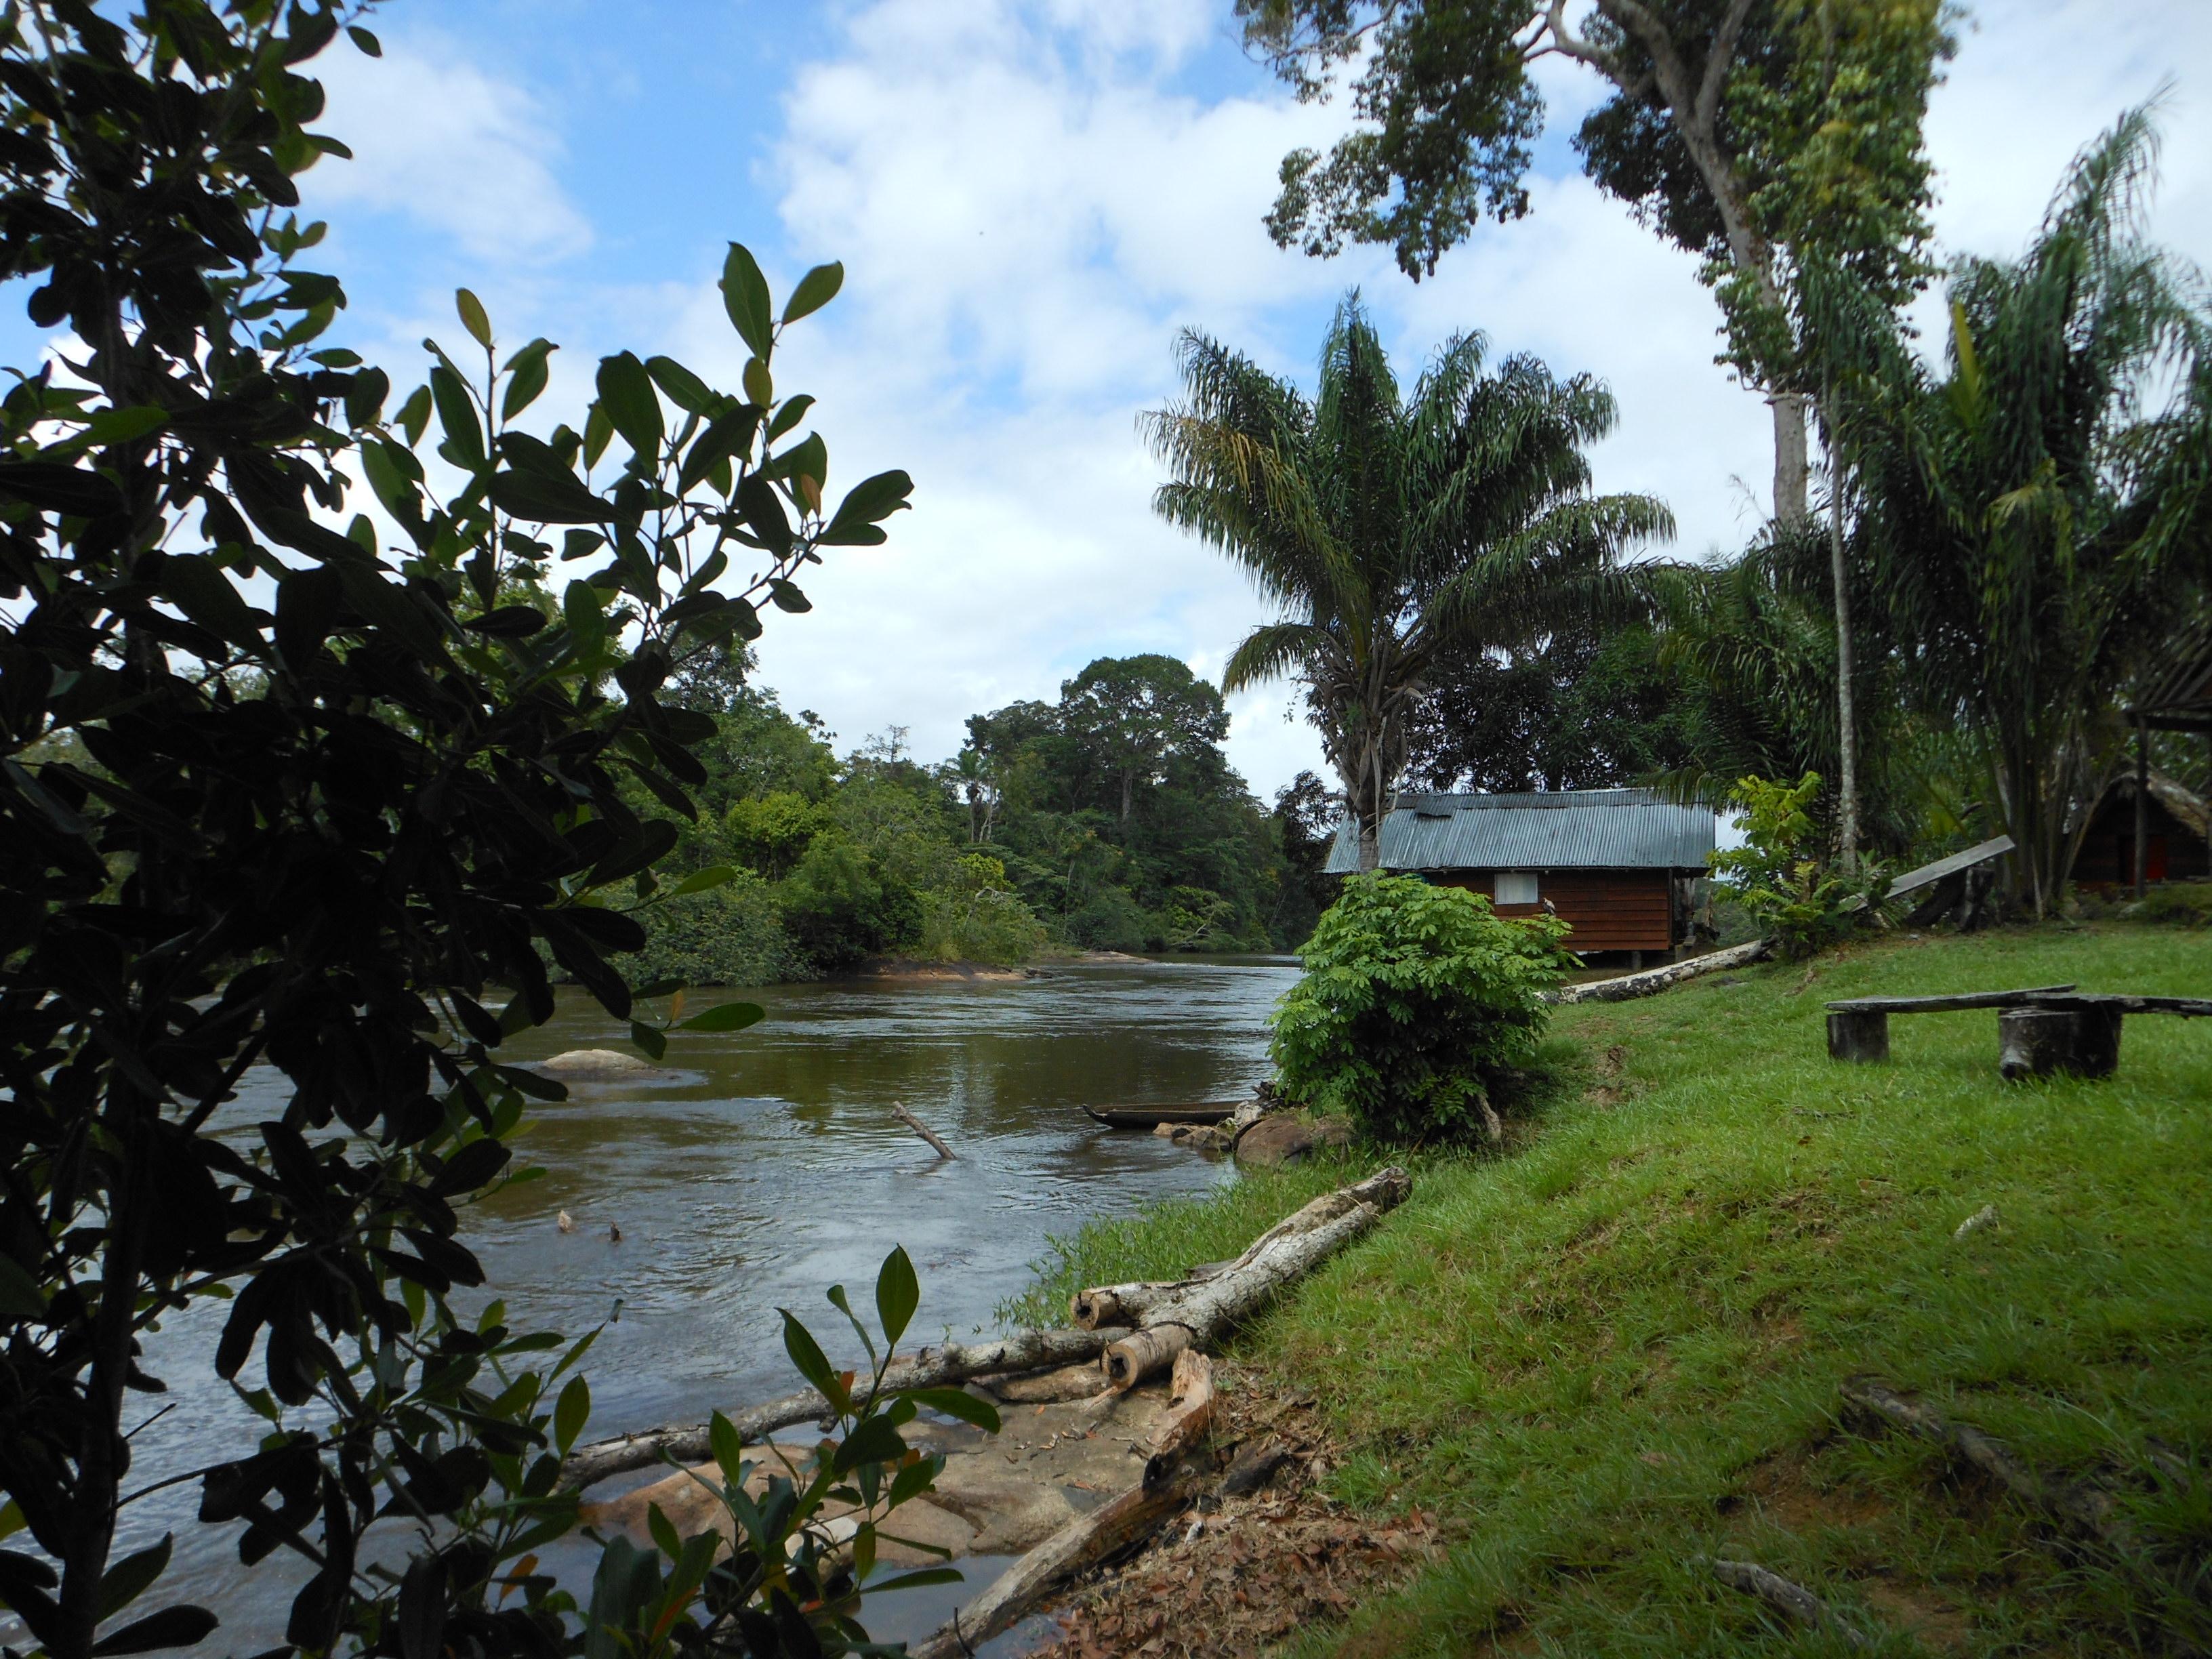 Suriname blog #7: Jungleland